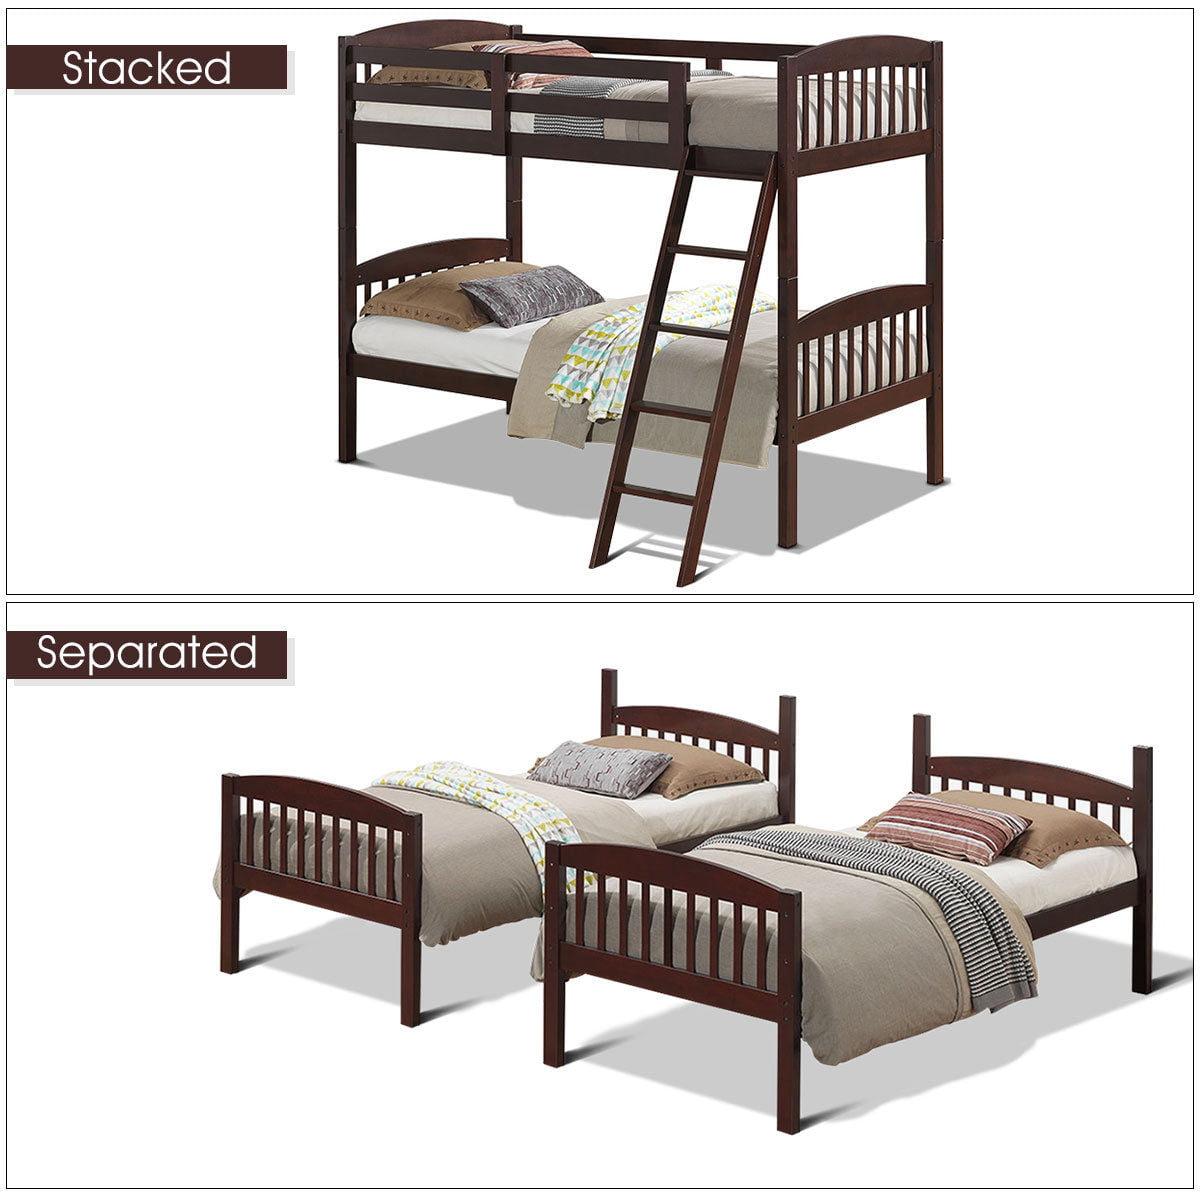 Costway Wood Solid Hardwood Twin Bunk Beds Detachable Safety Rail Walmart Com Walmart Com